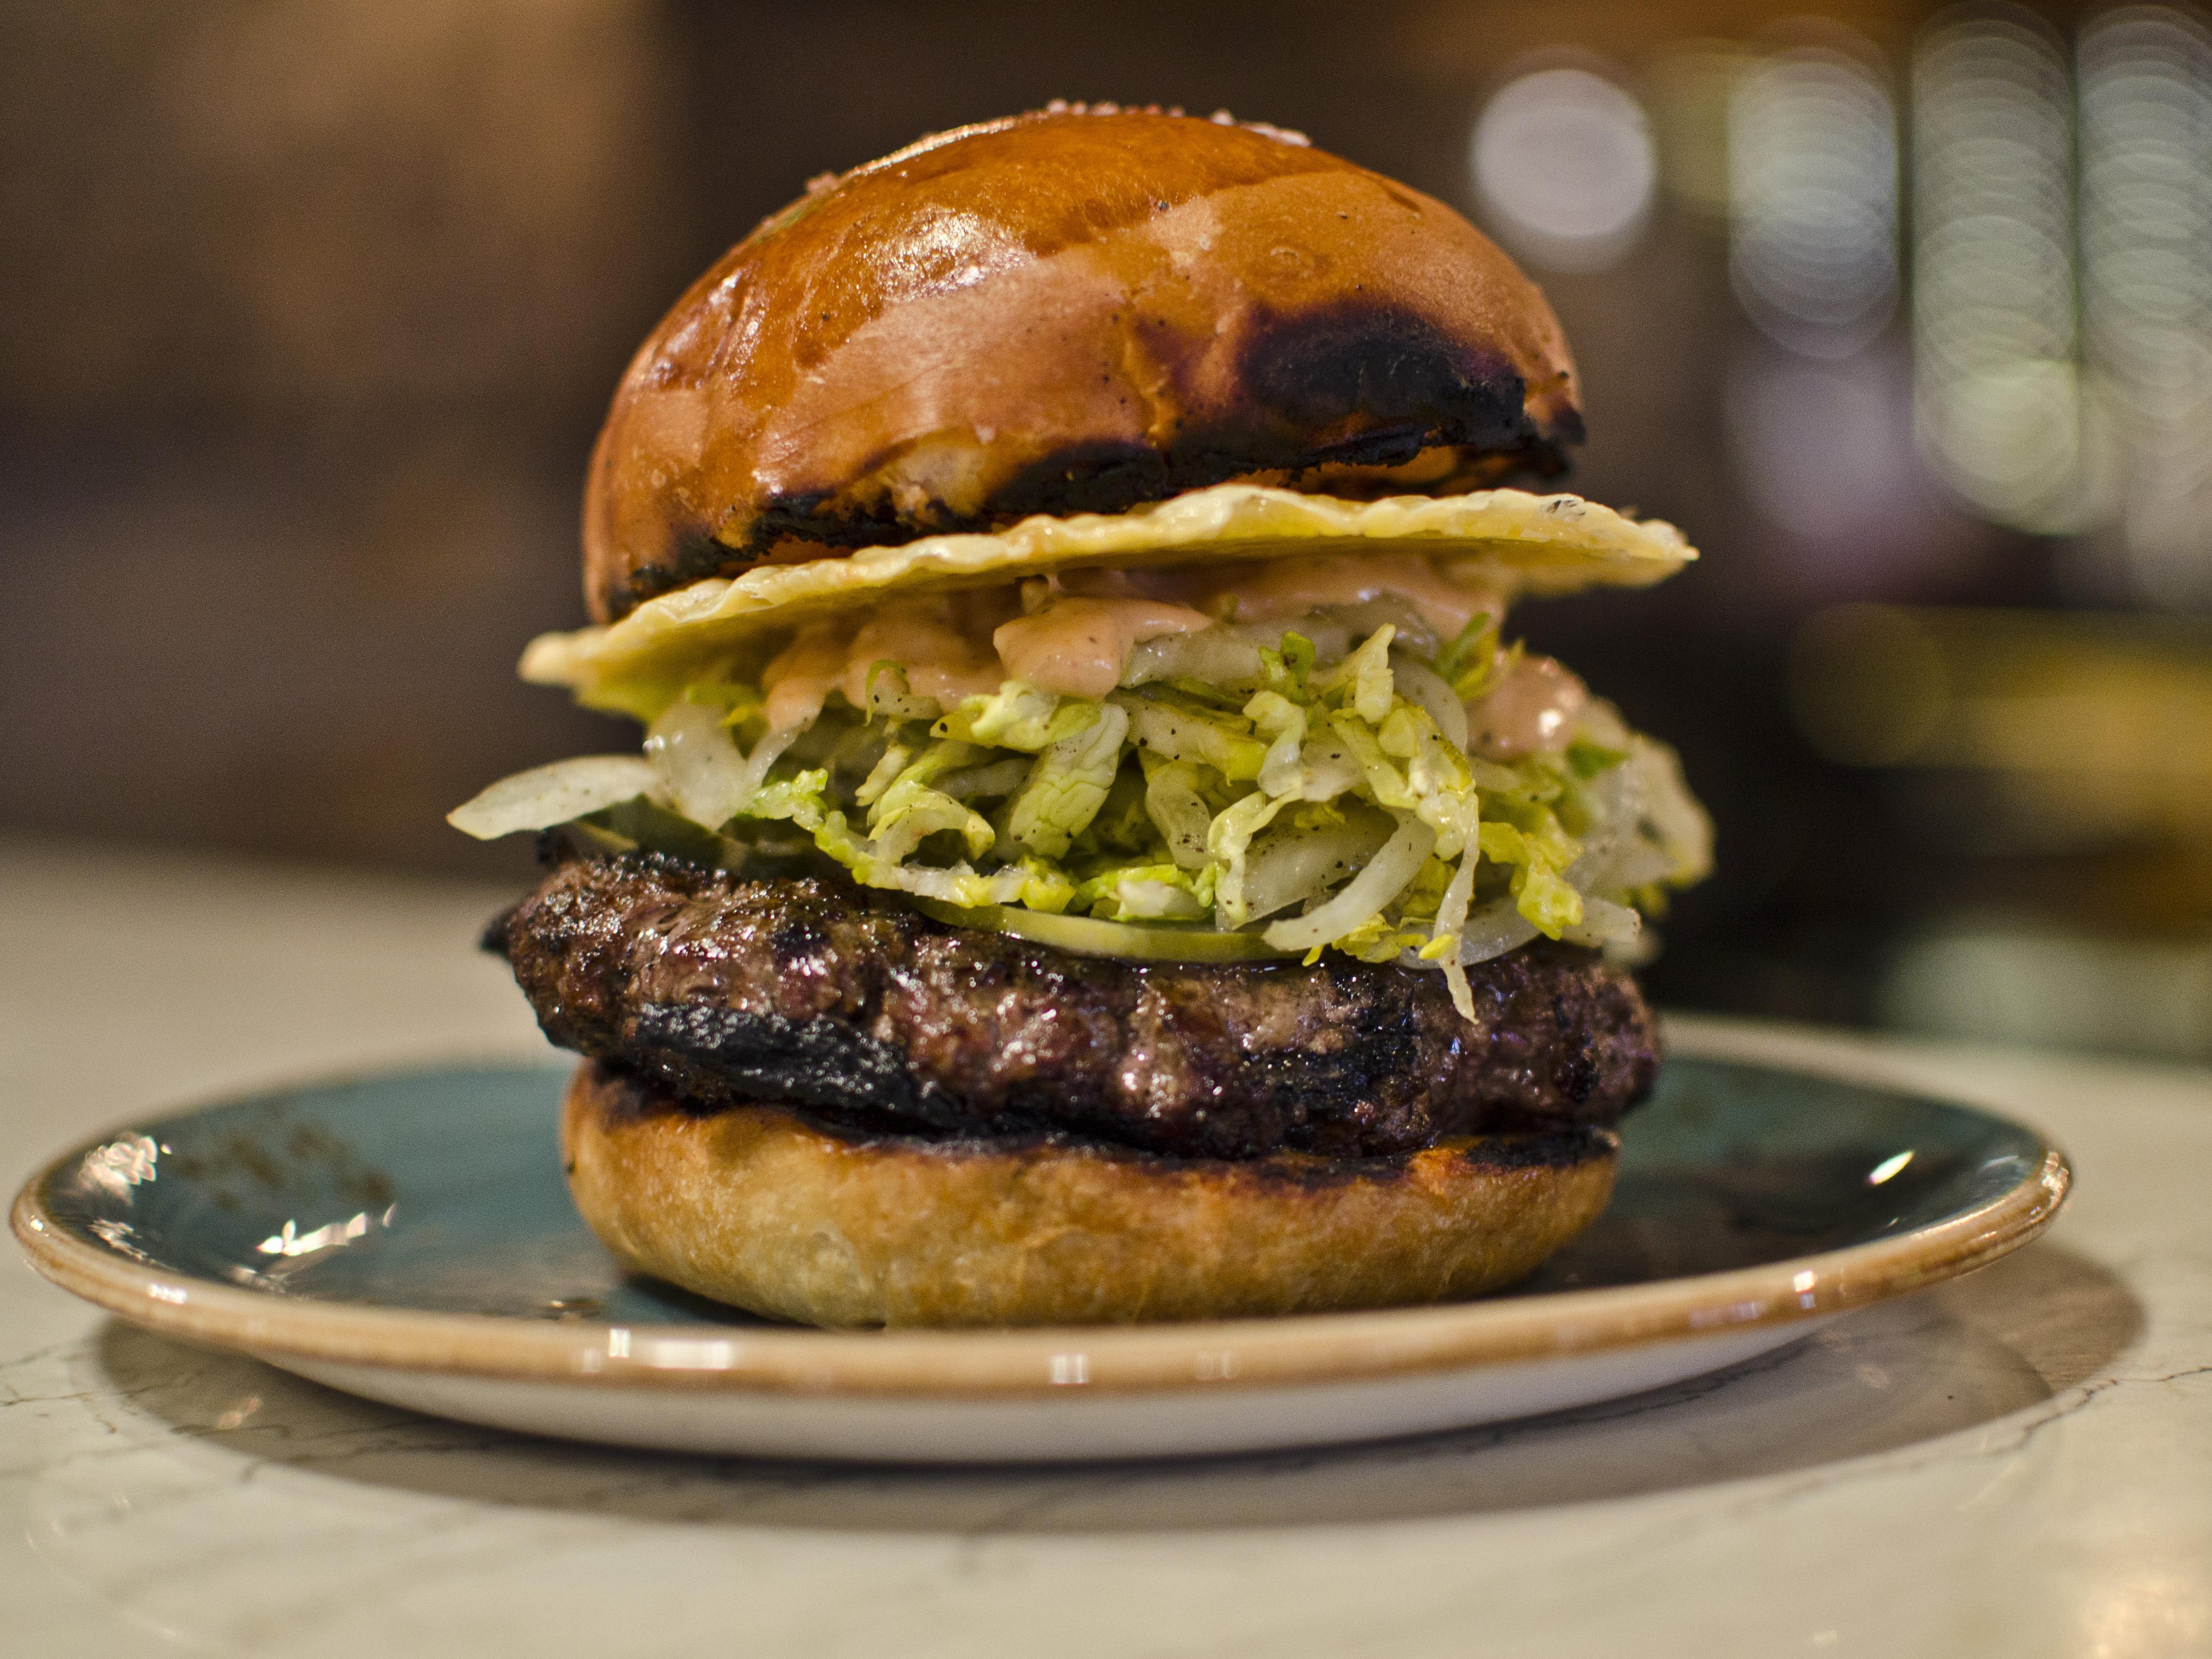 The burger at Alden & Harlow